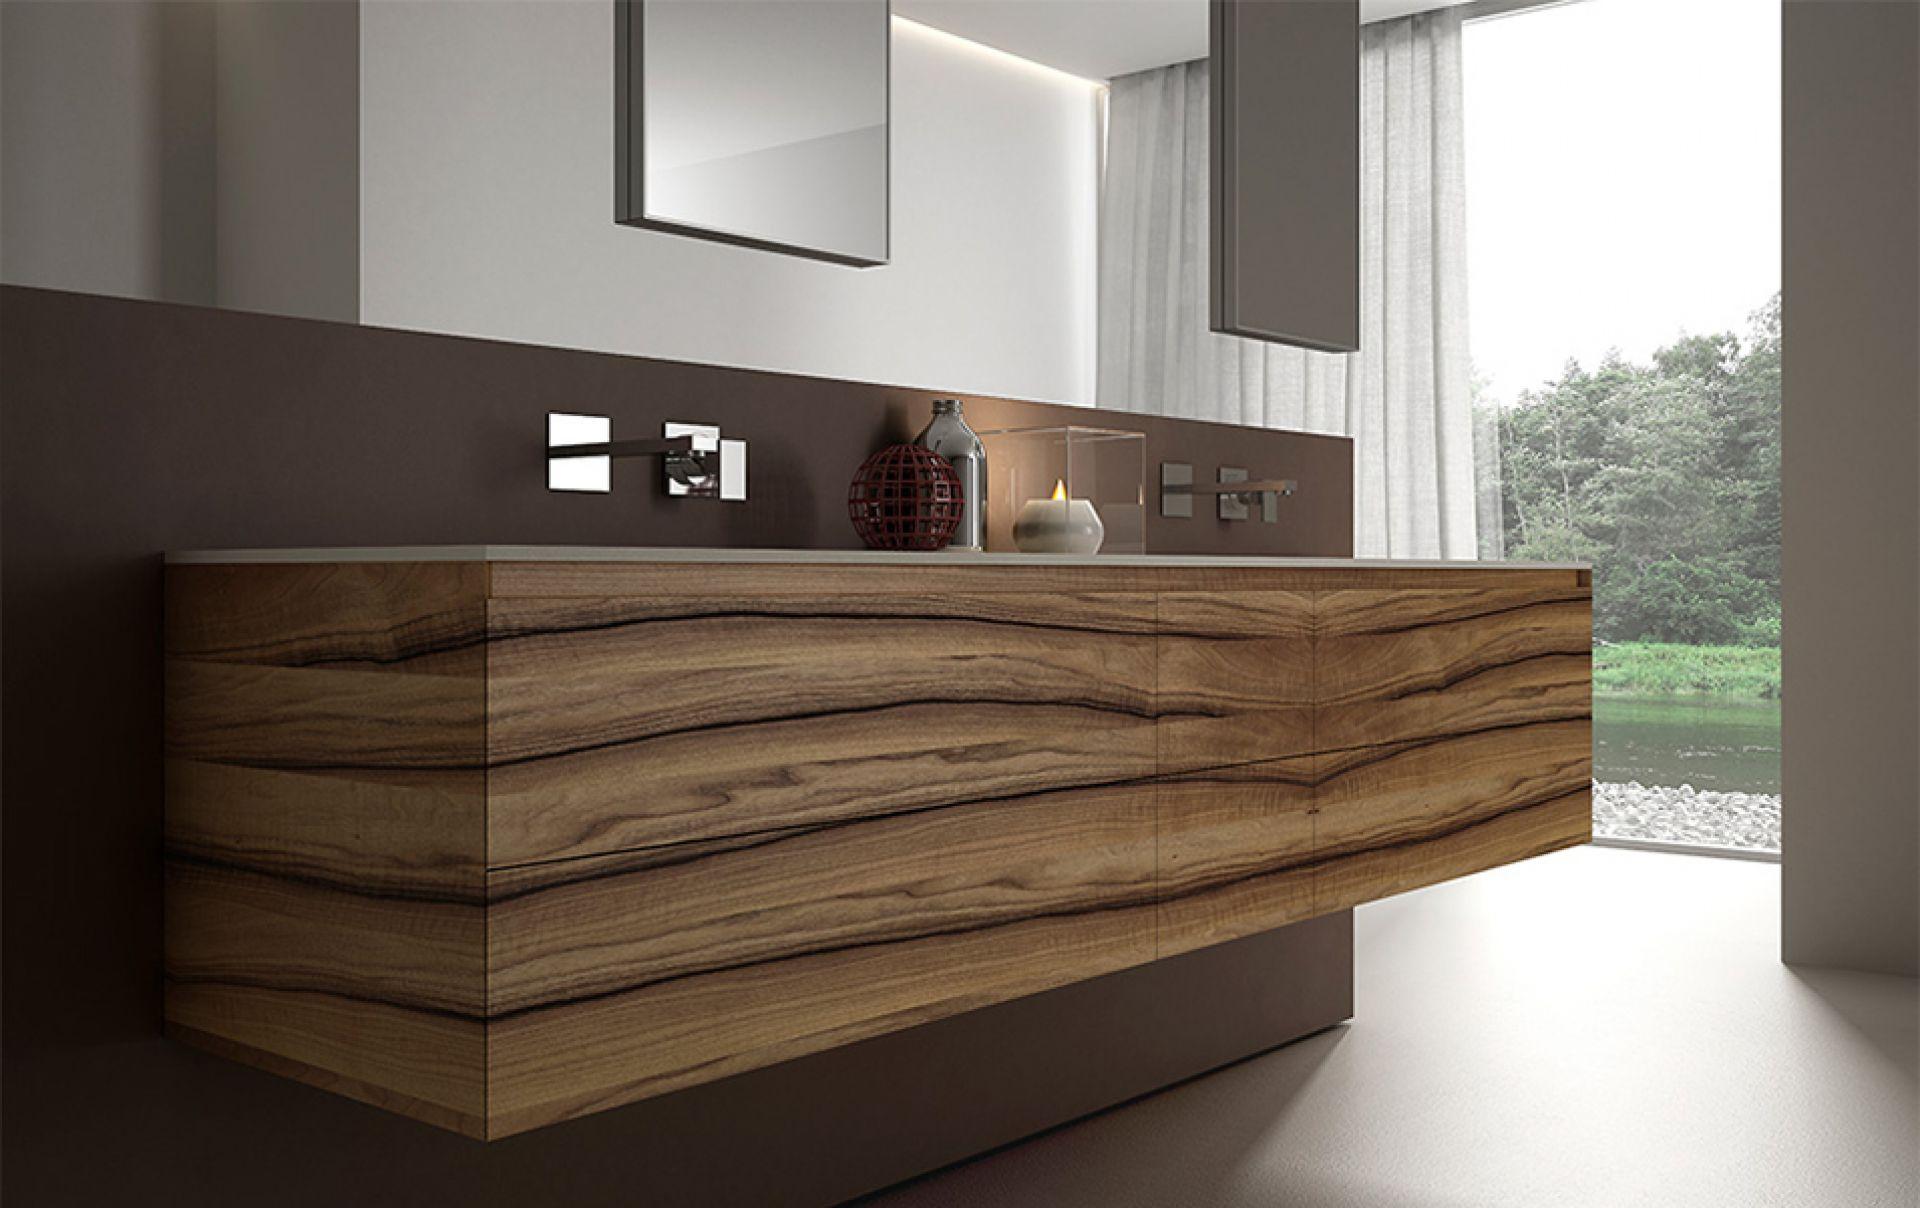 mobili bagno bergamo | abc interni - Arredo Bagno Bg